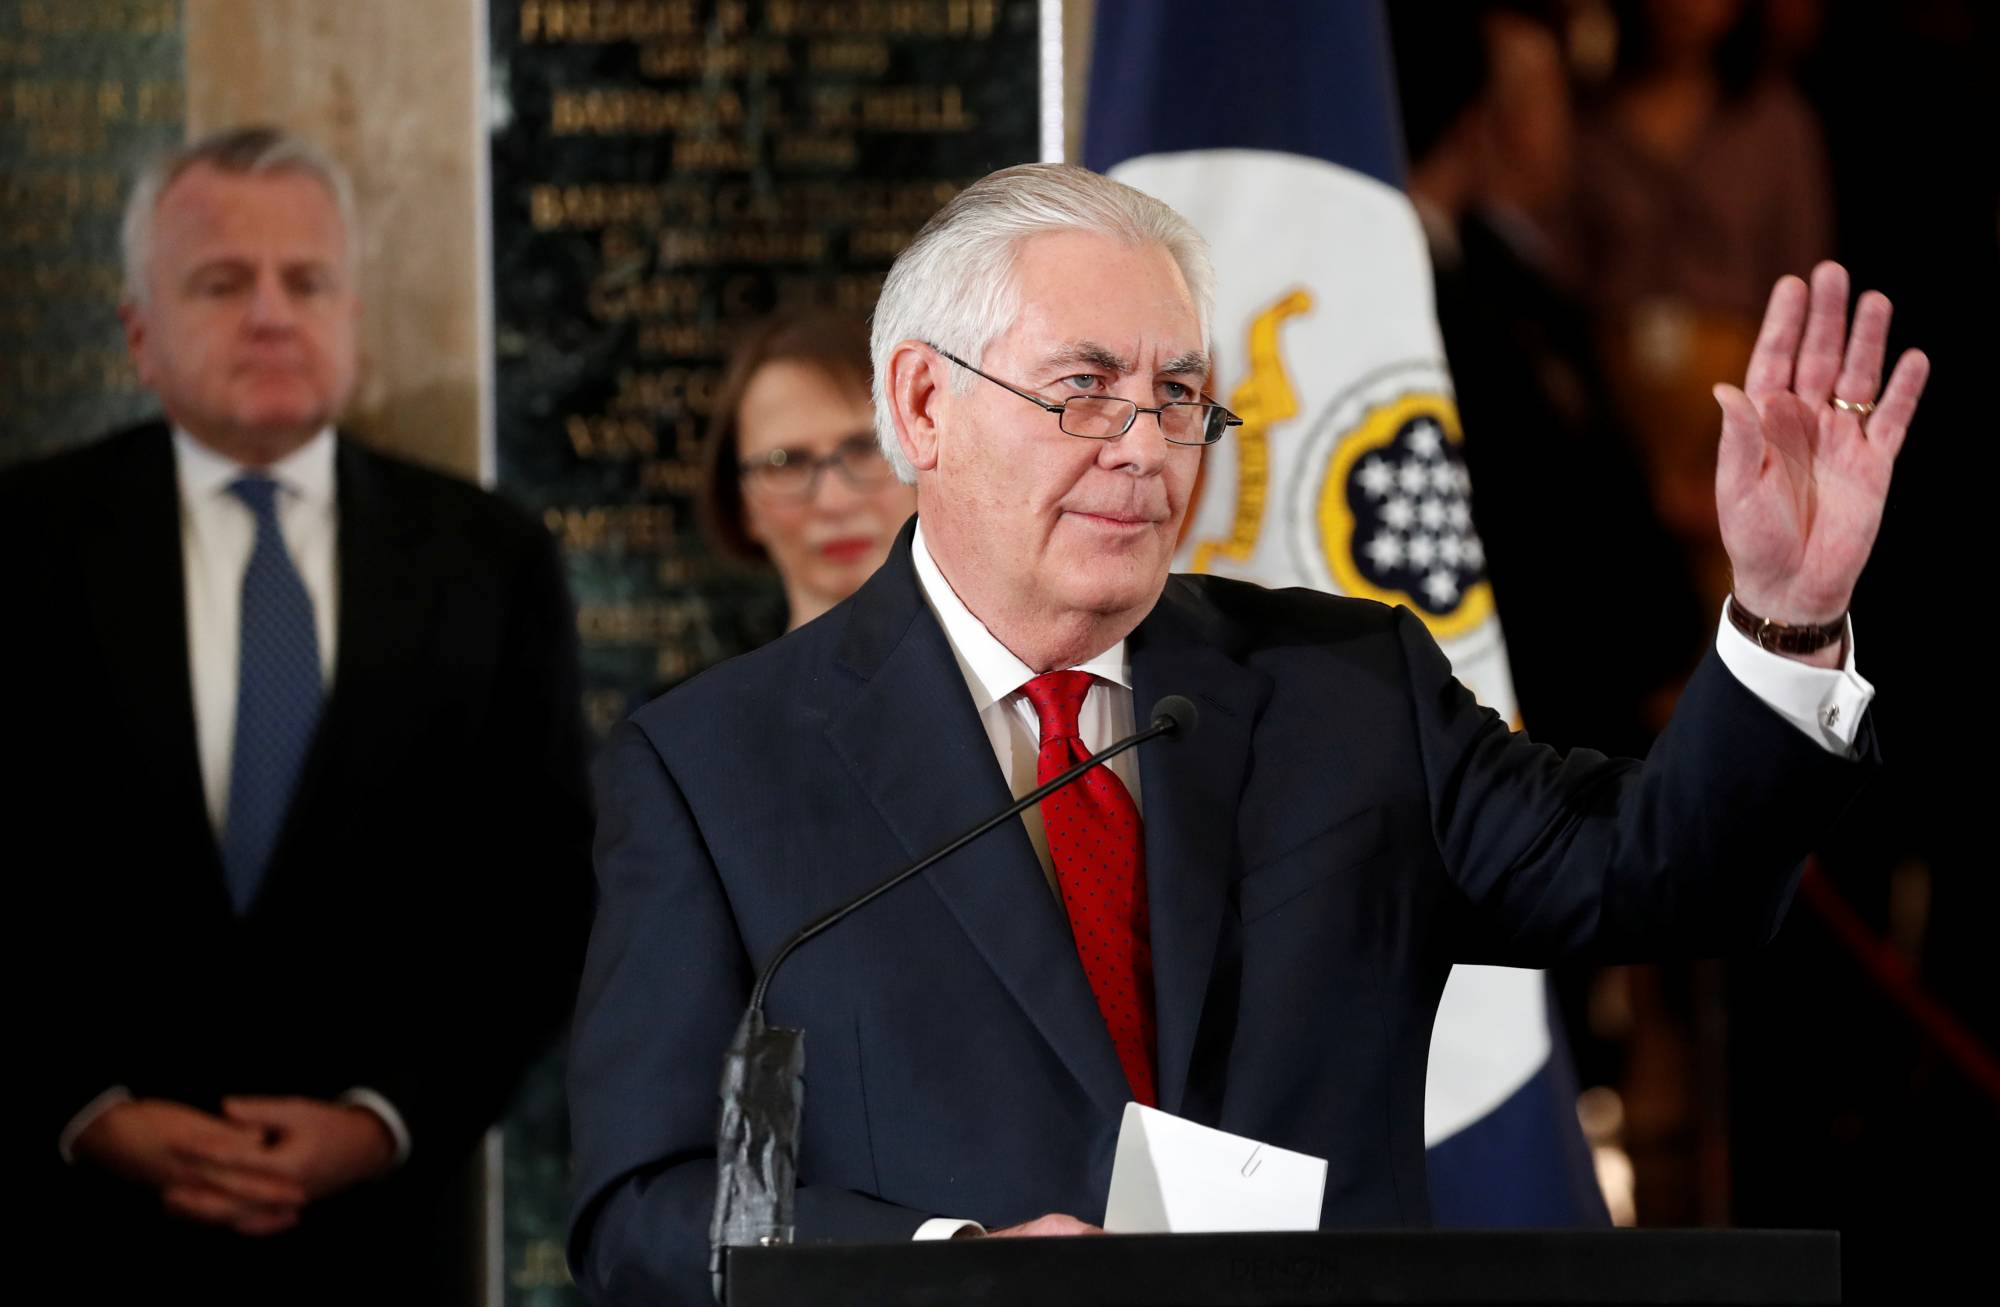 Rex Tillerson departs the State Department in Washington